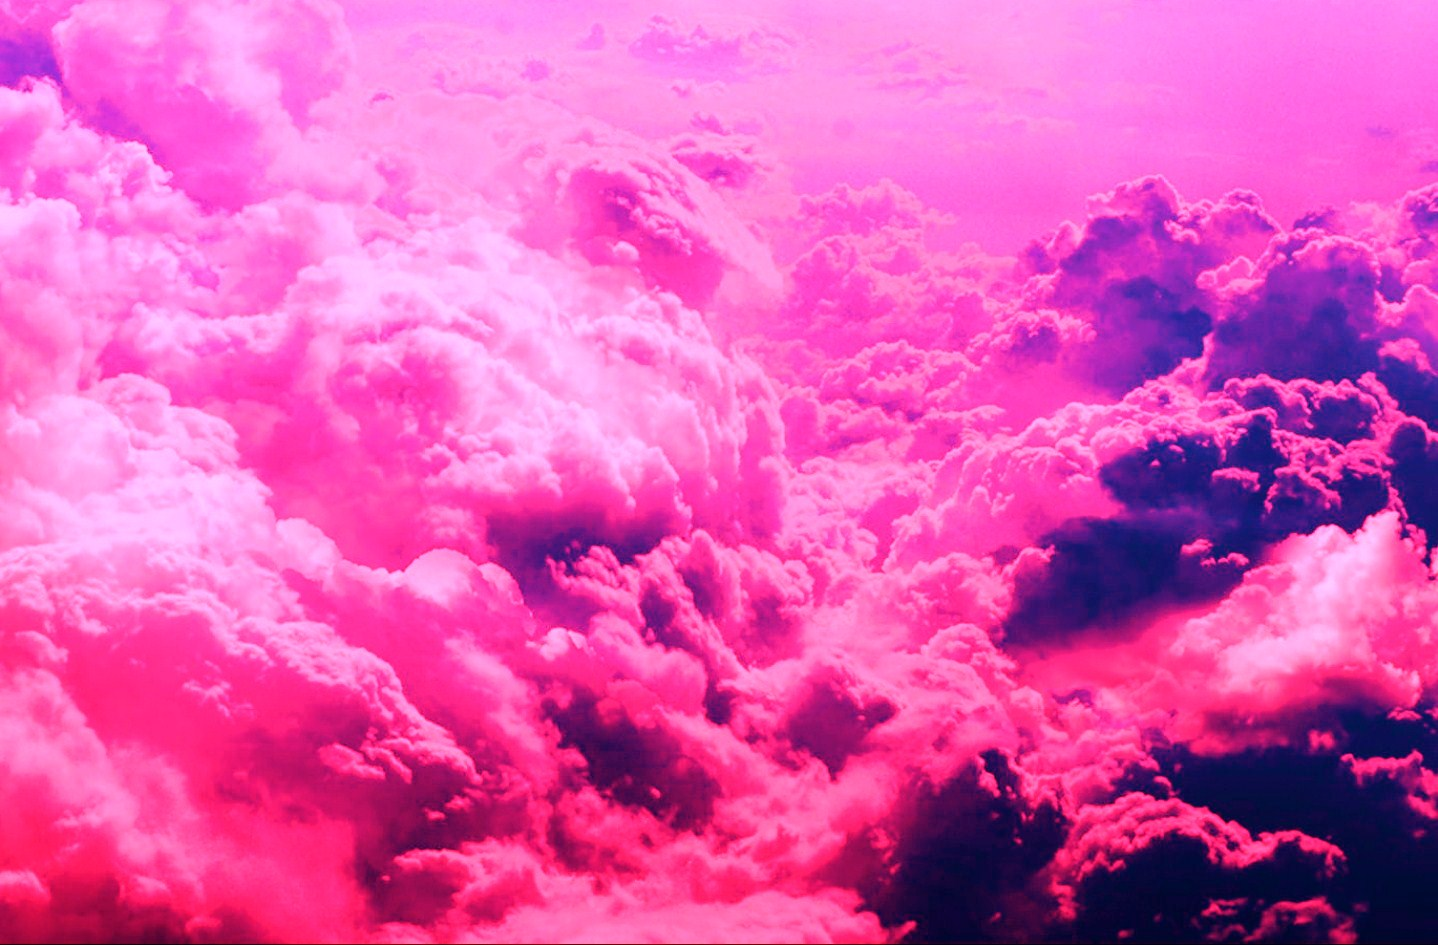 Pink clouds Computer Wallpapers Desktop Backgrounds 1438x945 ID 1438x945